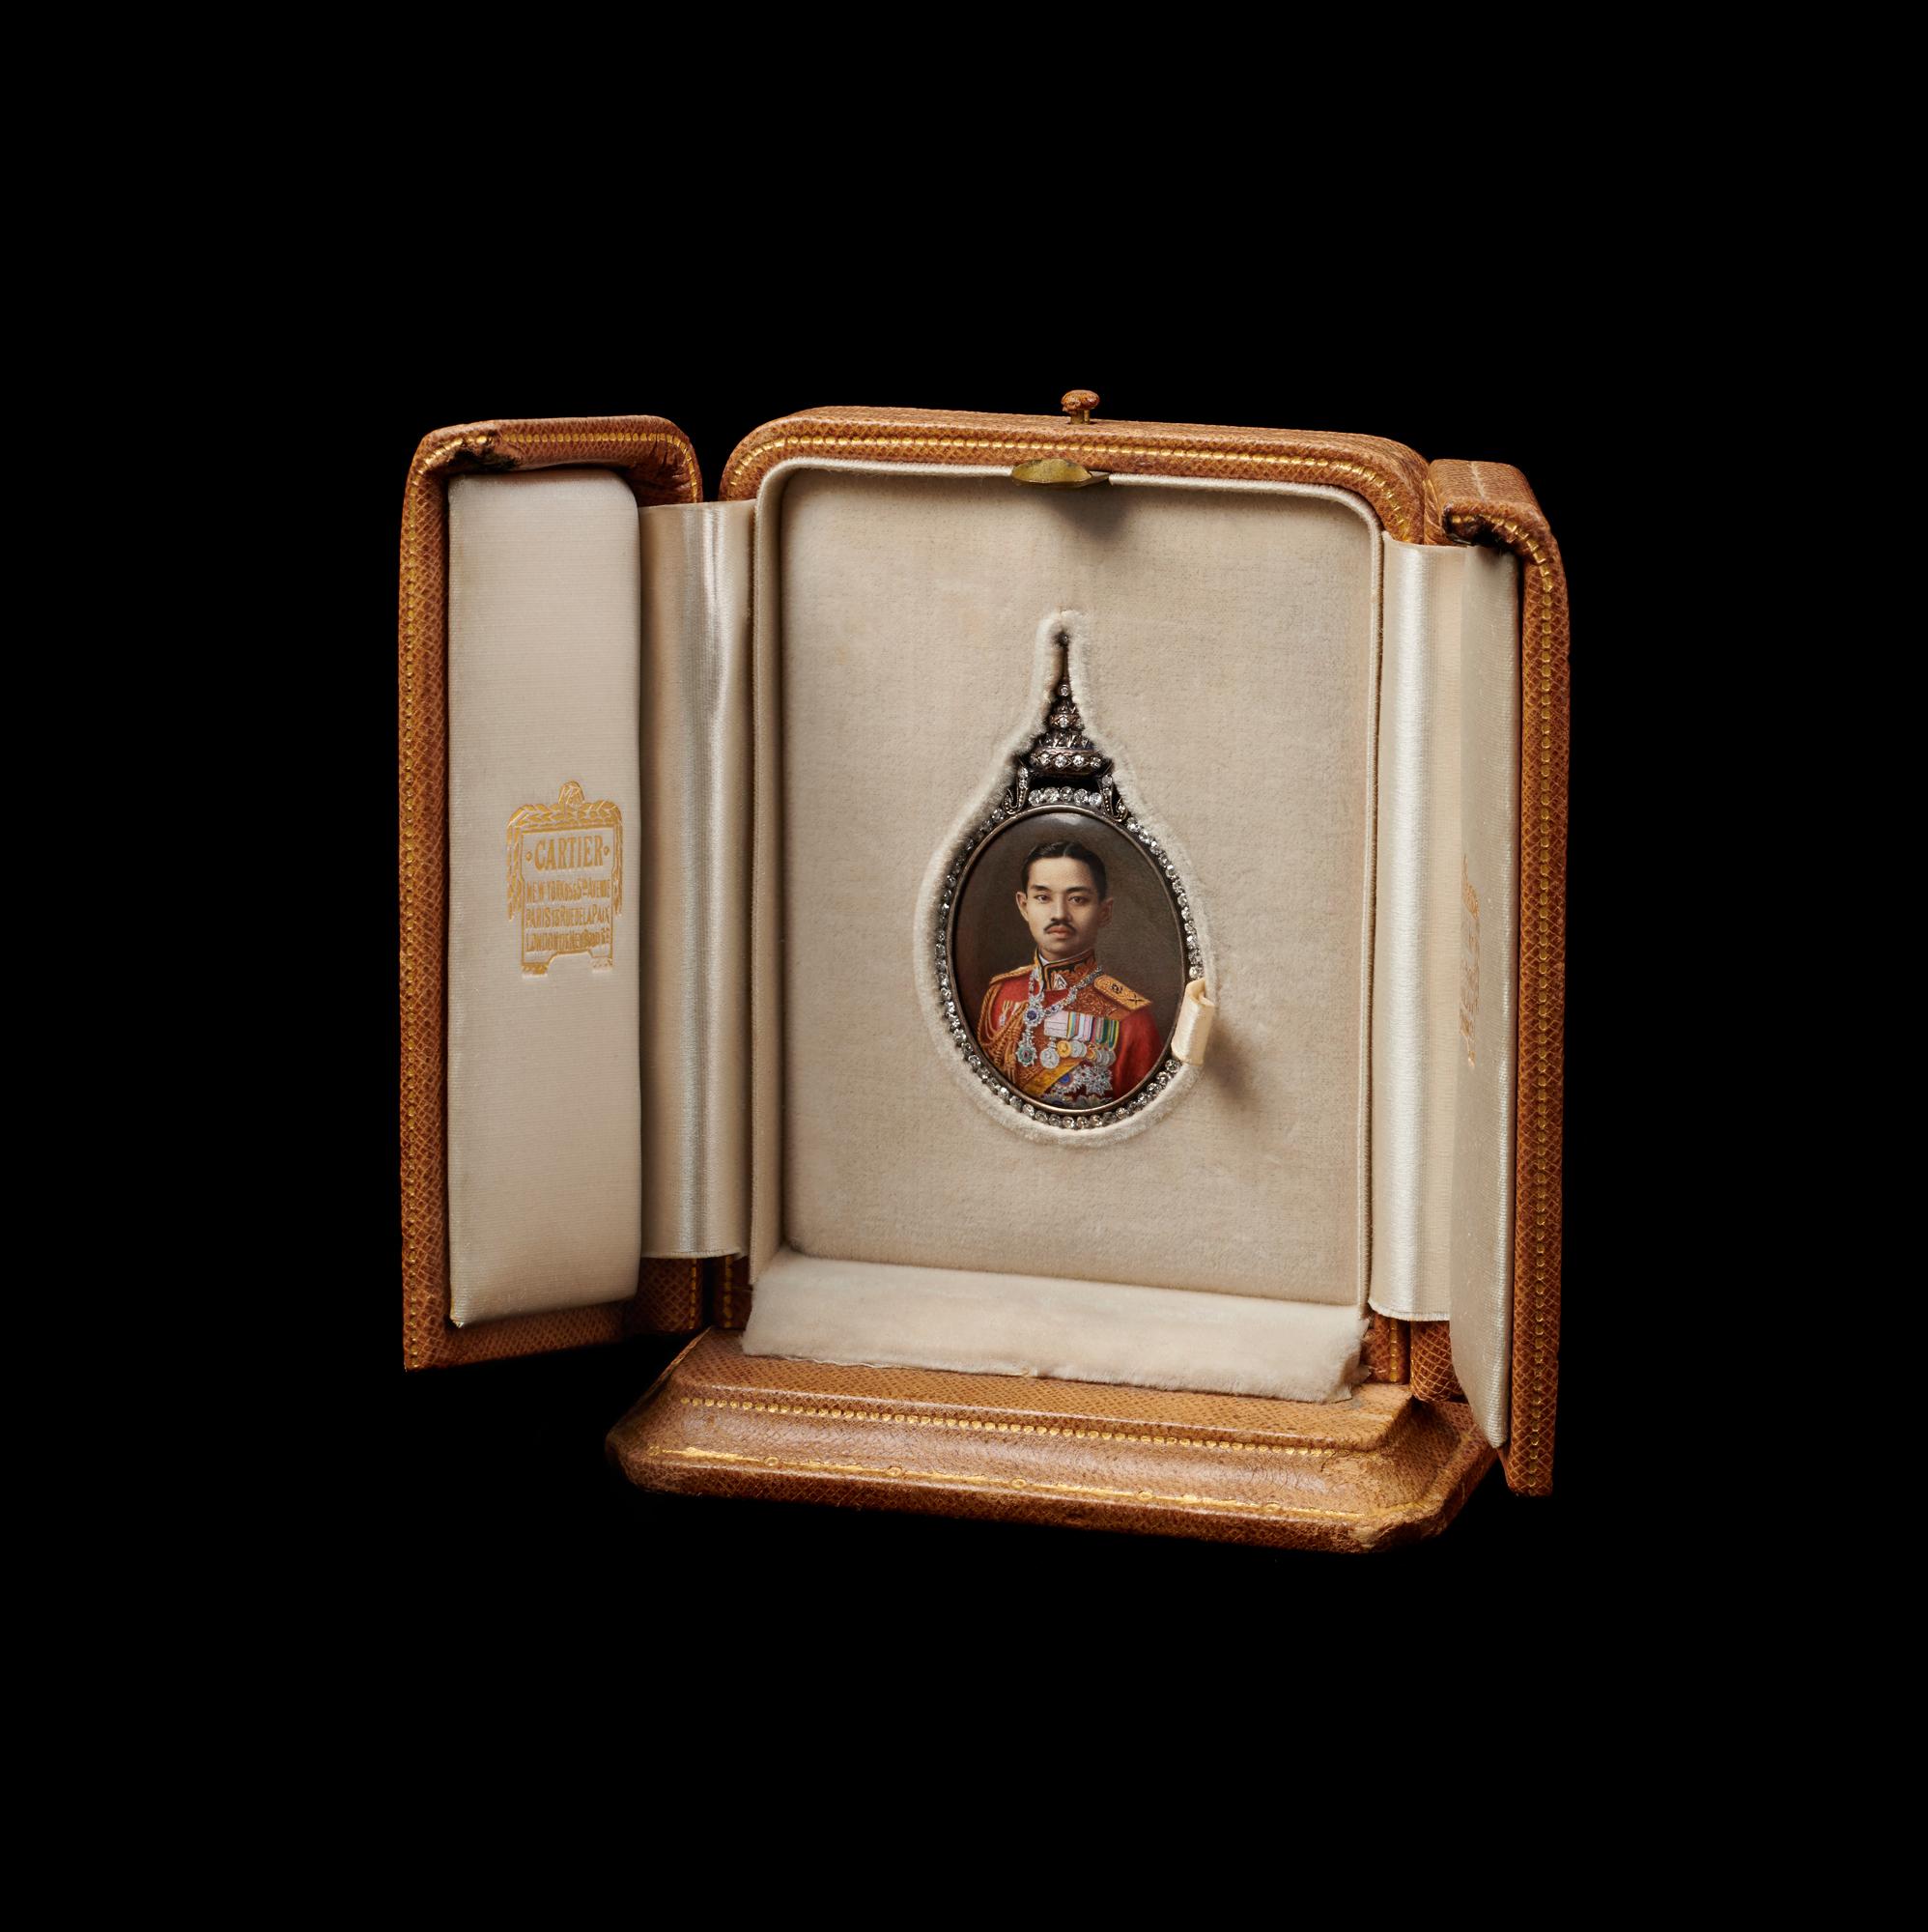 Enamel Portrait of King Prajadhipok in Gold Frame with Diamonds Gift from King Prajadhipok to First Lady Lou Henry Hoover, 1931 5.4 x 3.2 cm Courtesy of the Herbert Hoover Presidential Library and Museum; 65.6.124 (a-b)  พระบรมฉายาลักษณ์พระบาทสมเด็จพระปกเกล้าเจ้าอยู่หัวในกรอบทองฝังเพชร ของขวัญพระราชทานจากพระบาทสมเด็จพระปกเกล้าเจ้าอยู่หัว แก่นางลู เฮนรี ฮูเวอร์ สุภาพสตรีหมายเลขหนึ่ง พ.ศ. ๒๔๗๔ ๕.๔ x ๓.๒ ซม. ได้รับความอนุเคราะห์จากพิพิธภัณฑ์และหอสมุดประธานาธิบดีเฮอร์เบิร์ต ฮูเวอร์